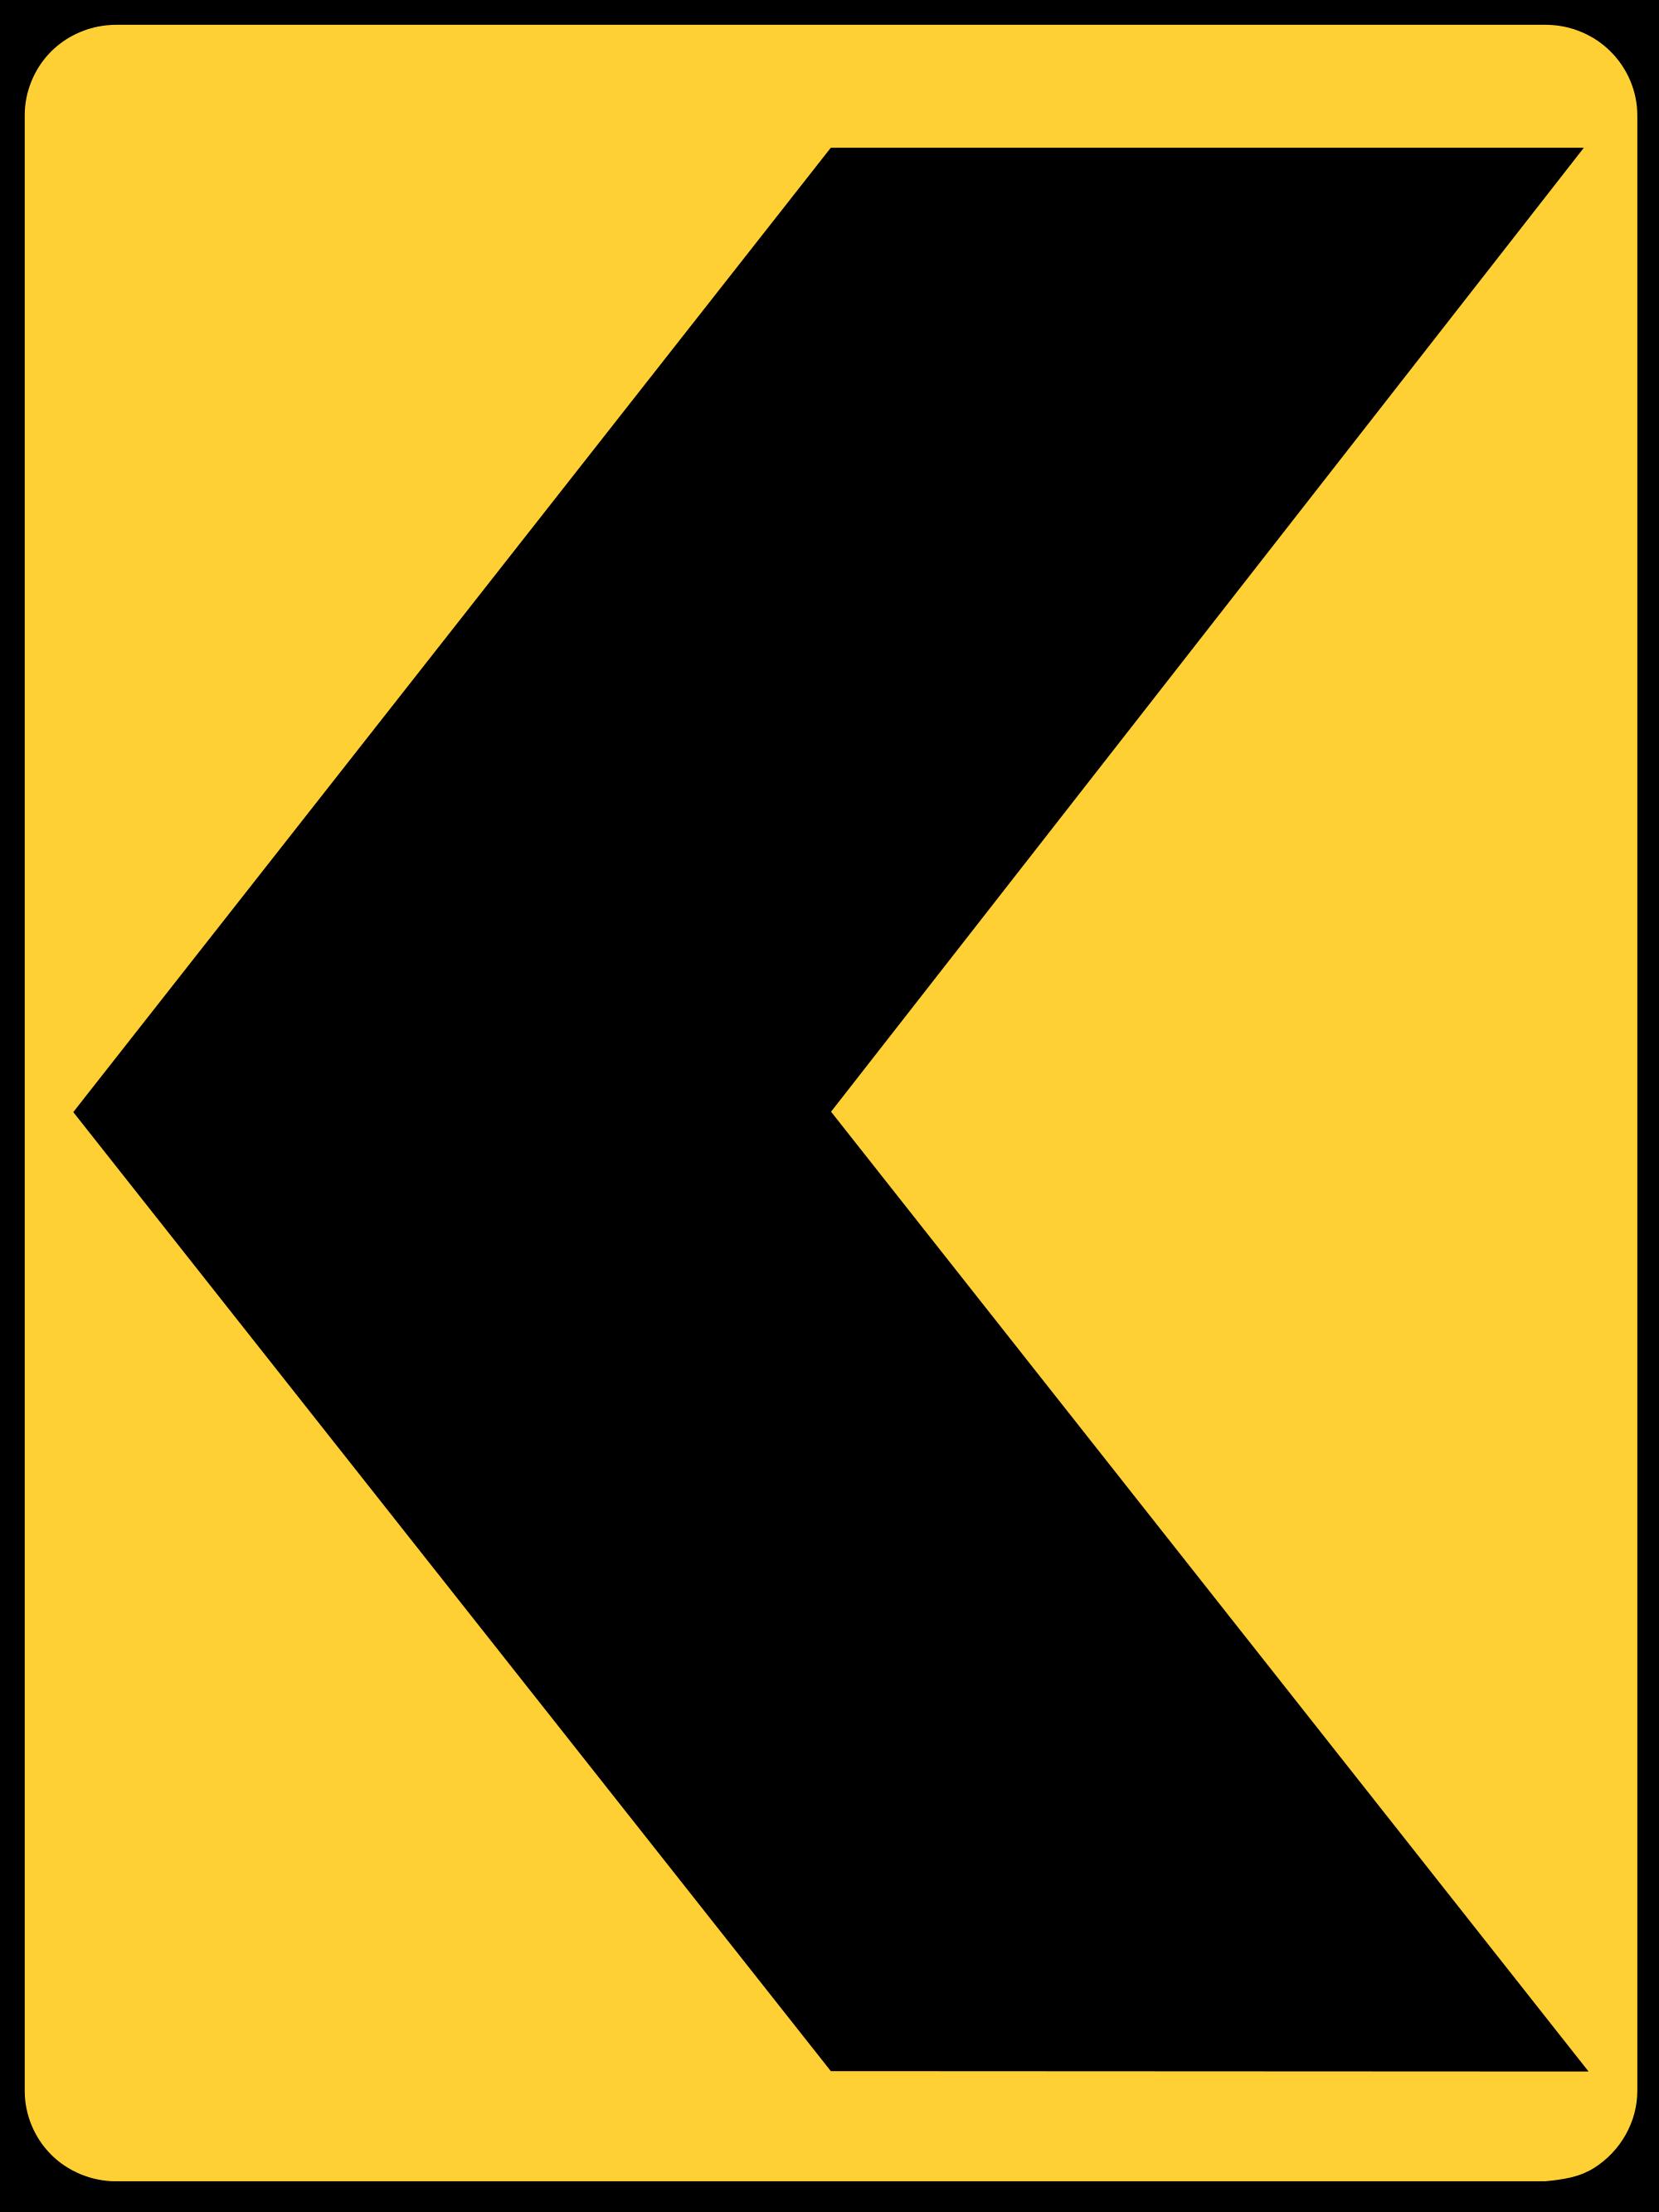 W1-8L Warning Sign